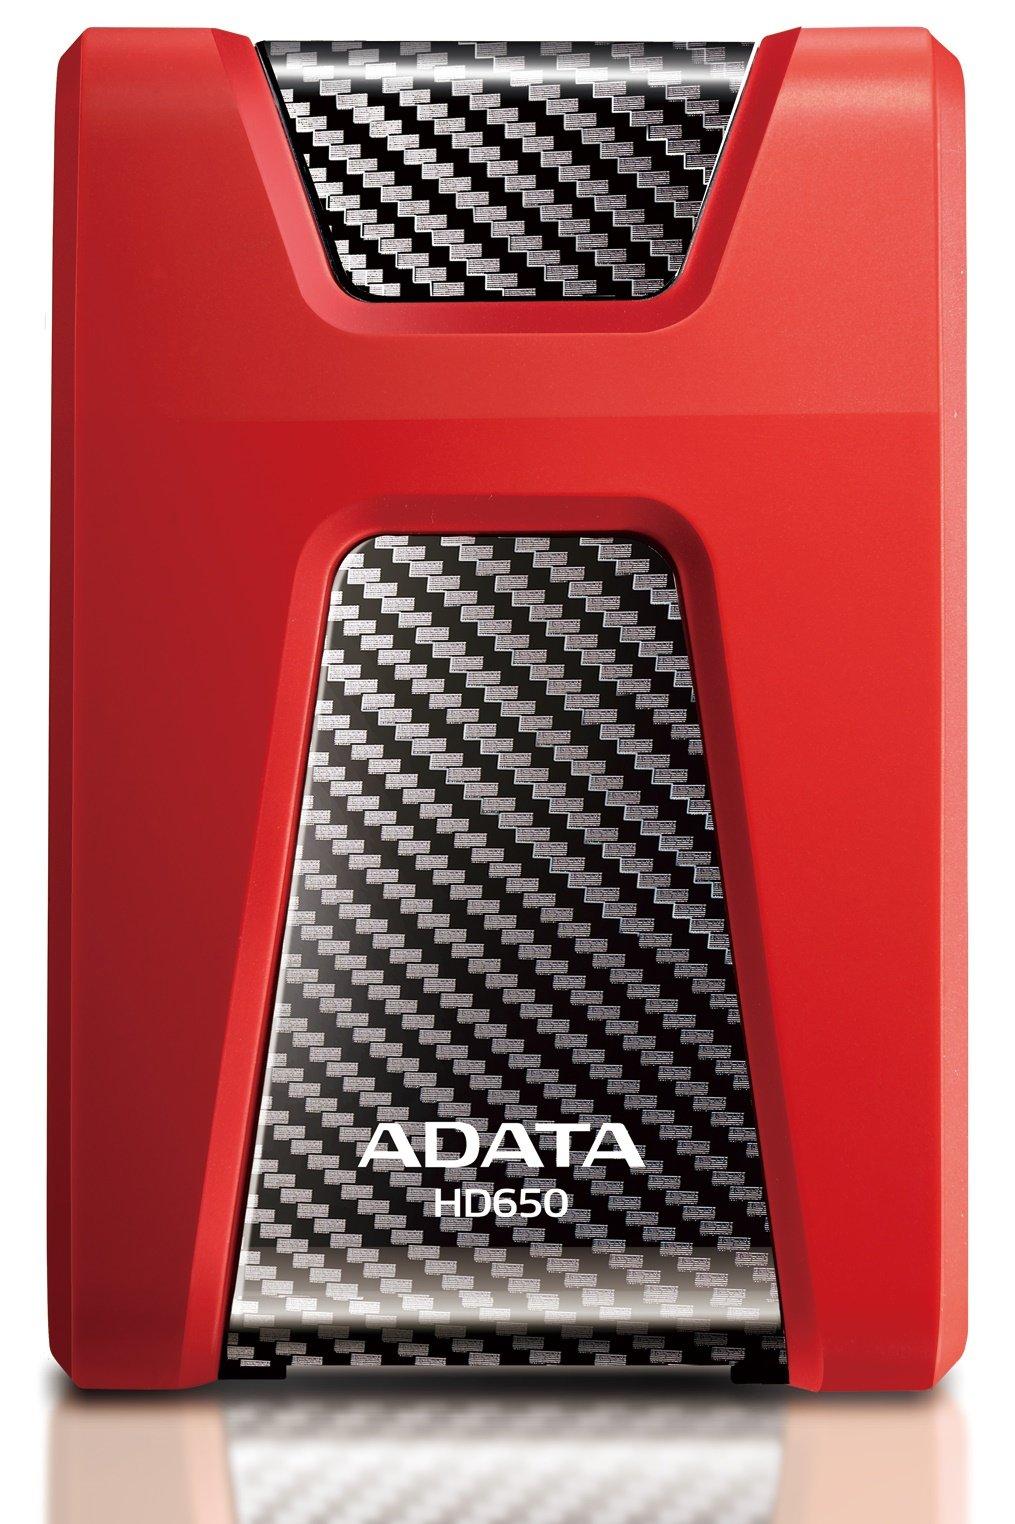 ADATA HD650 HDD externí disk 1TB USB 3.0 červený